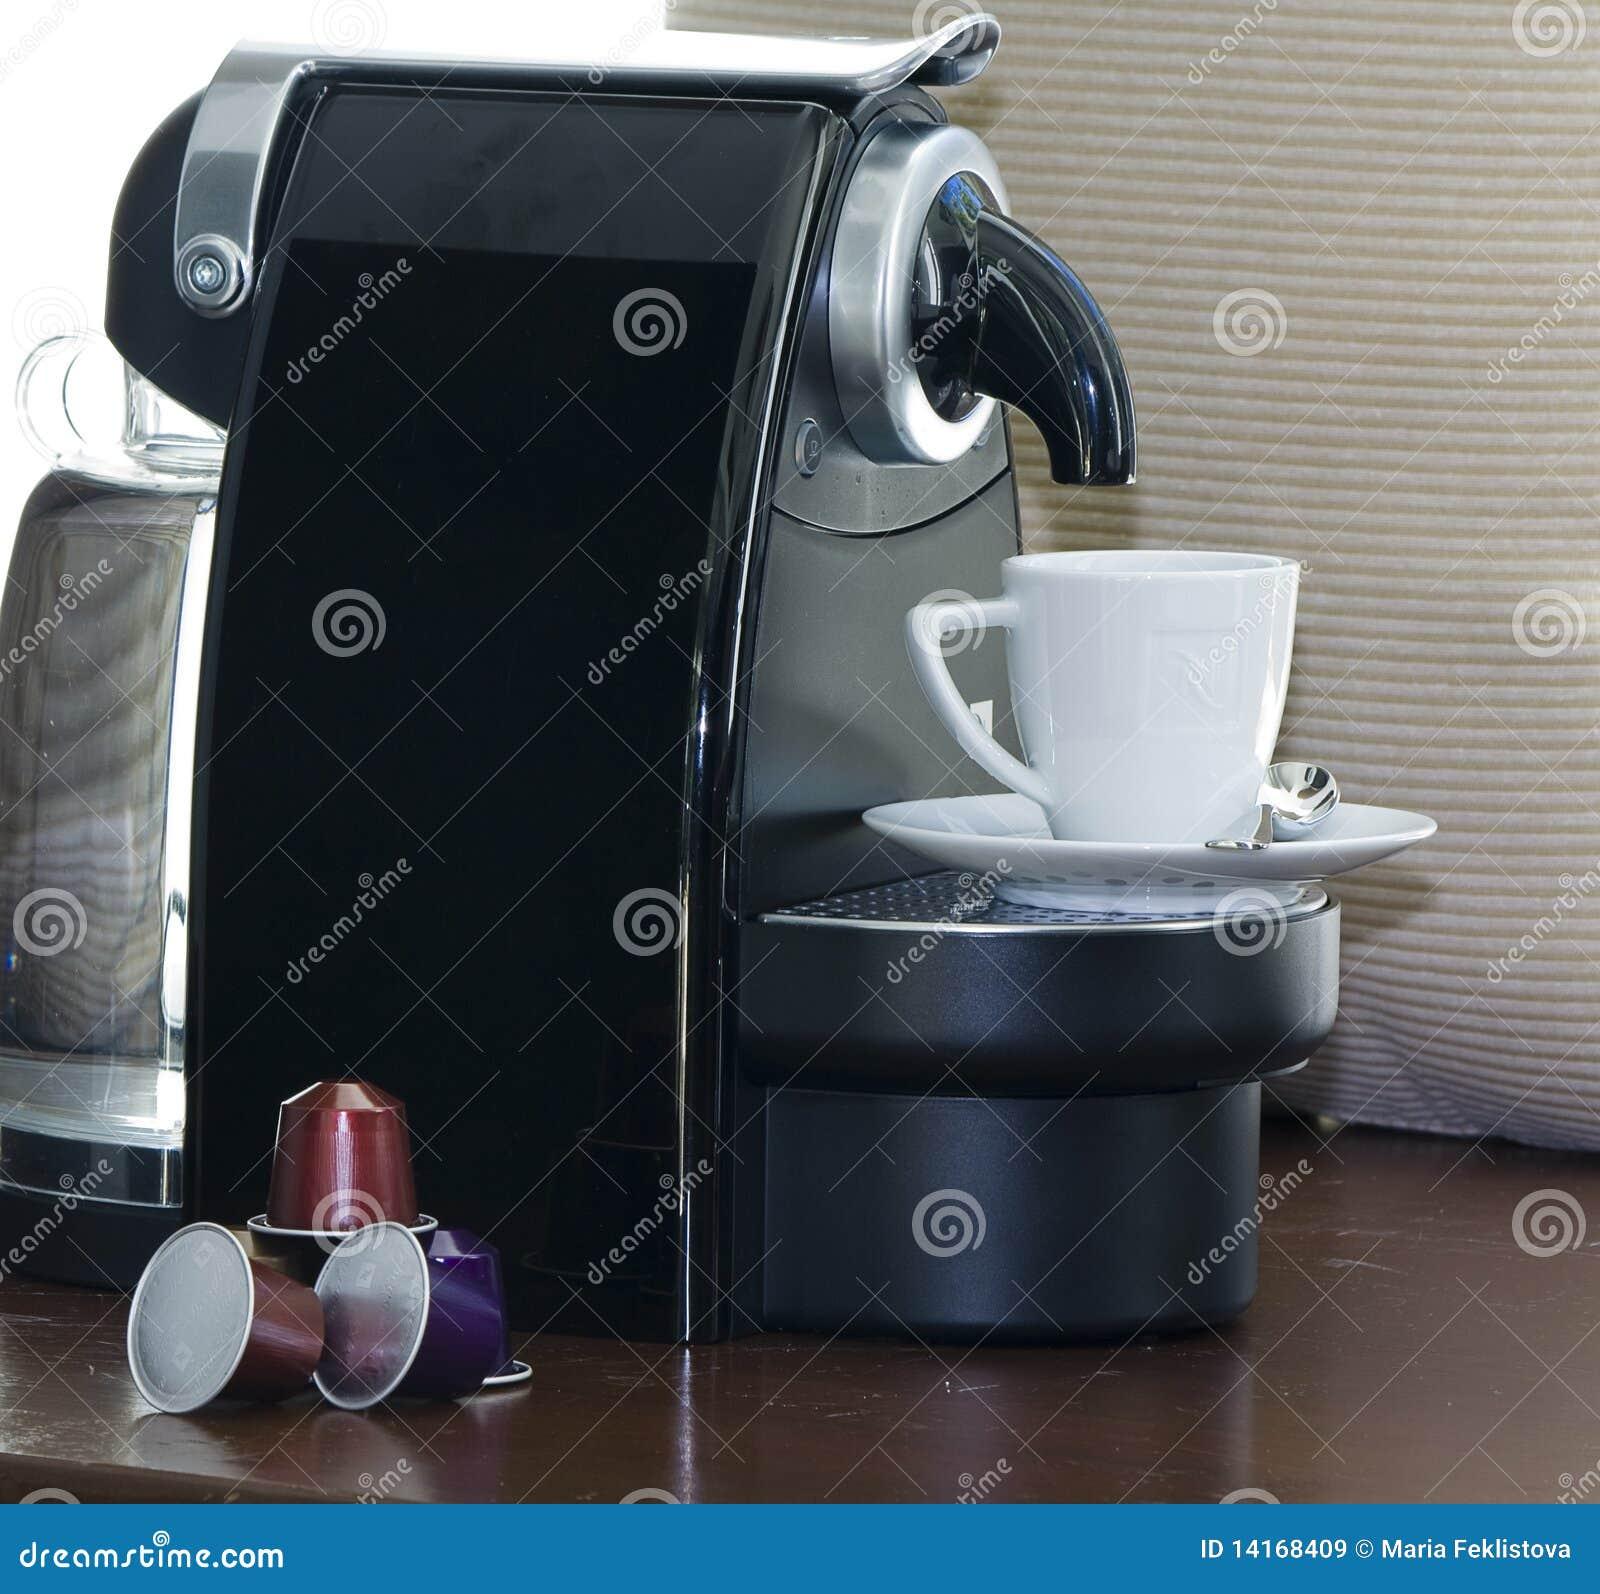 Prix Capsules De Caf Ef Bf Bd L Or Espresso